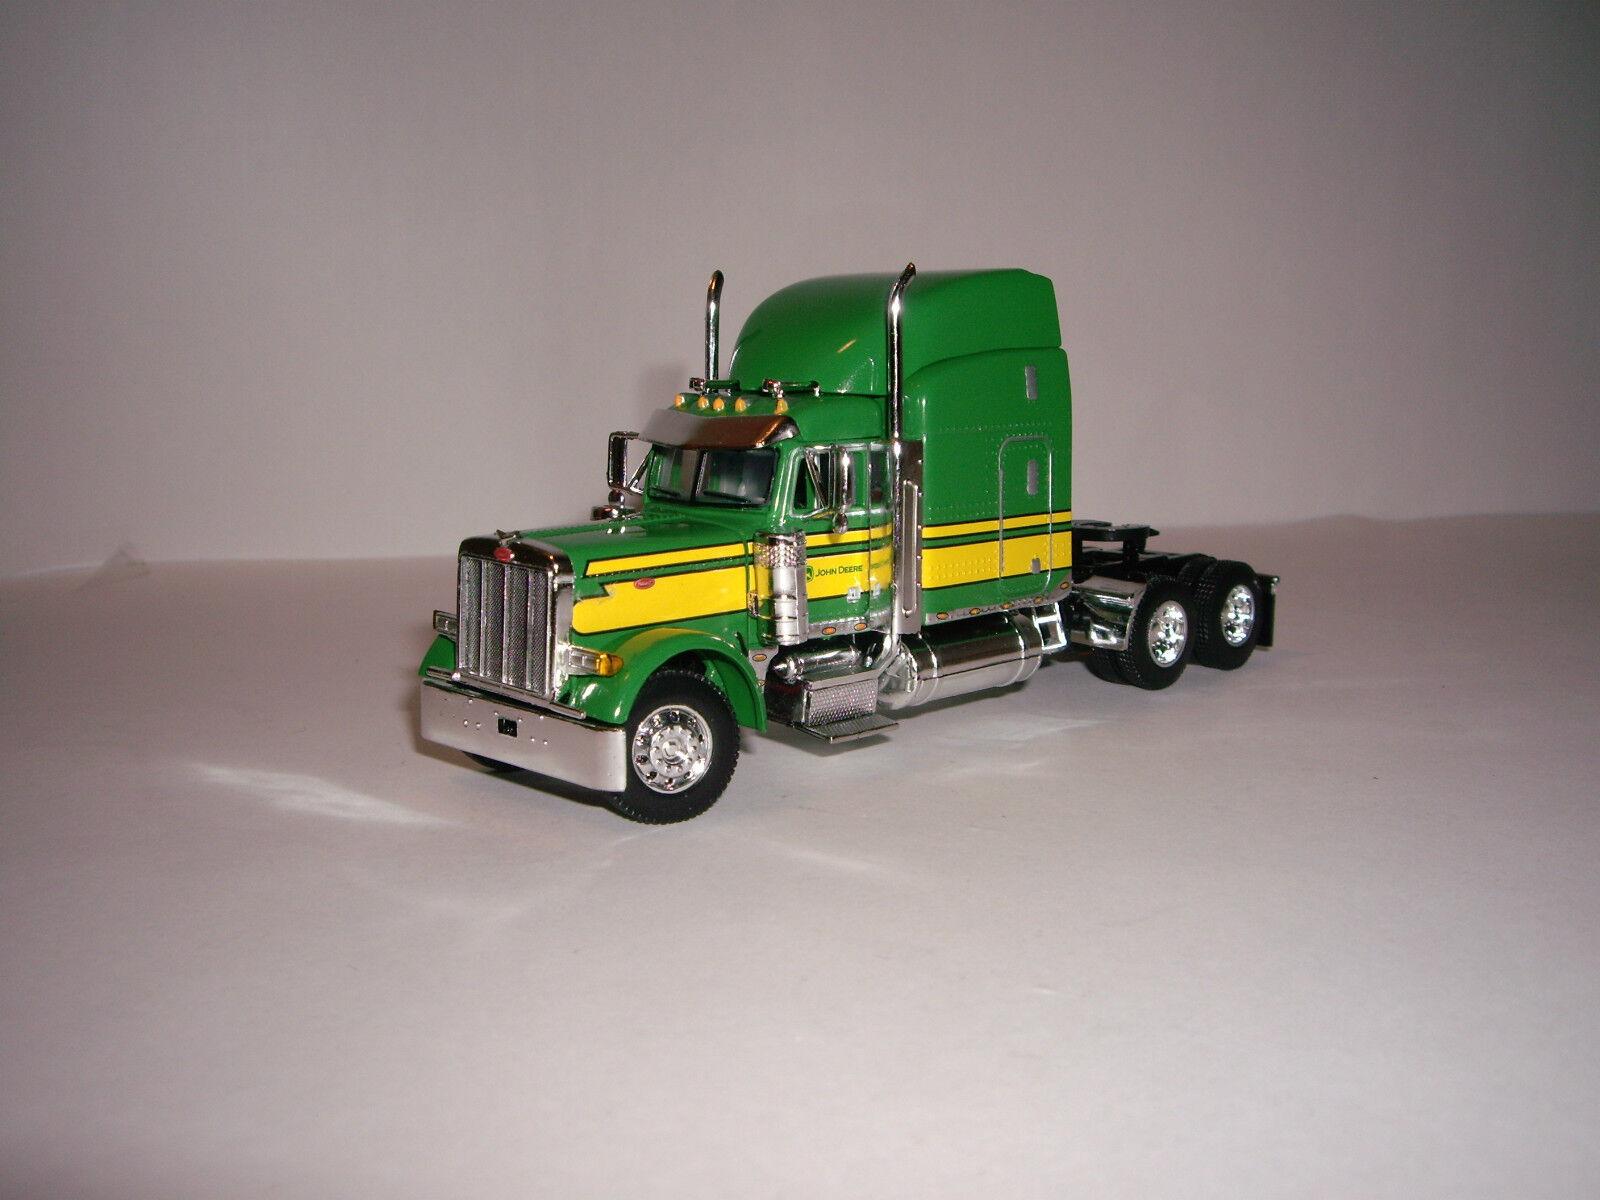 DCP First Gear 1 64 verde y amarillo John Deere 379 Peterbilt con T midroof durmiente